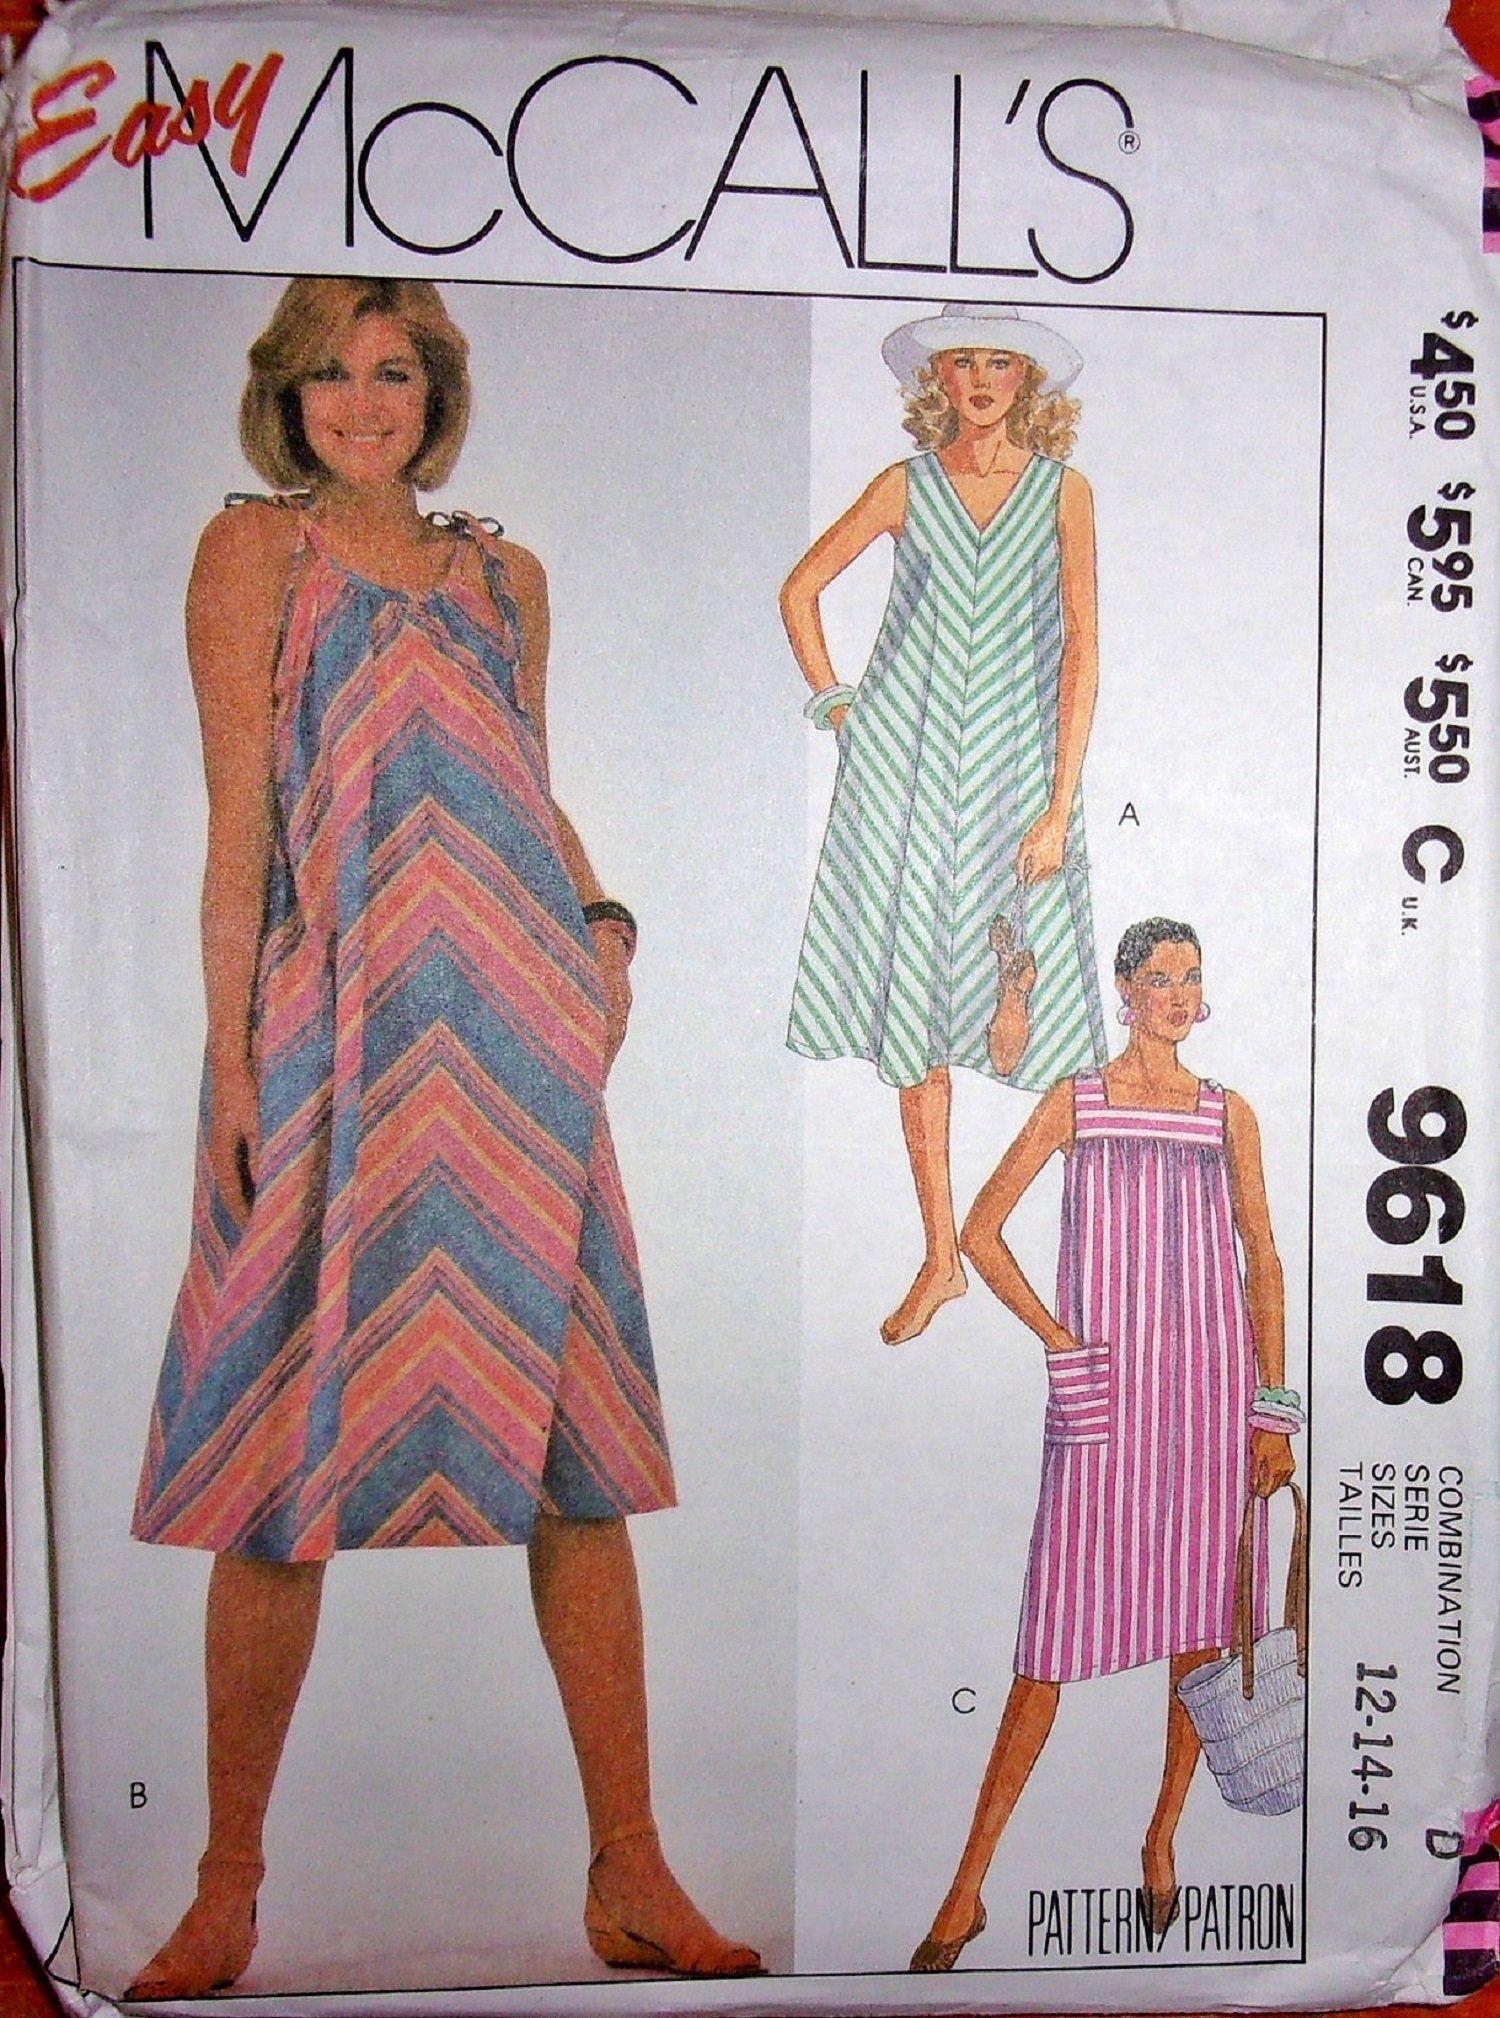 c2872baa90 Vtg 1980s McCall s 9618 Sewing Pattern Easy Pullover Sundress Beach Tent  Dress Muu Muu Caftan Women s Size 12 14 Plus 16 Bust 34 36 38 UC FF by ...